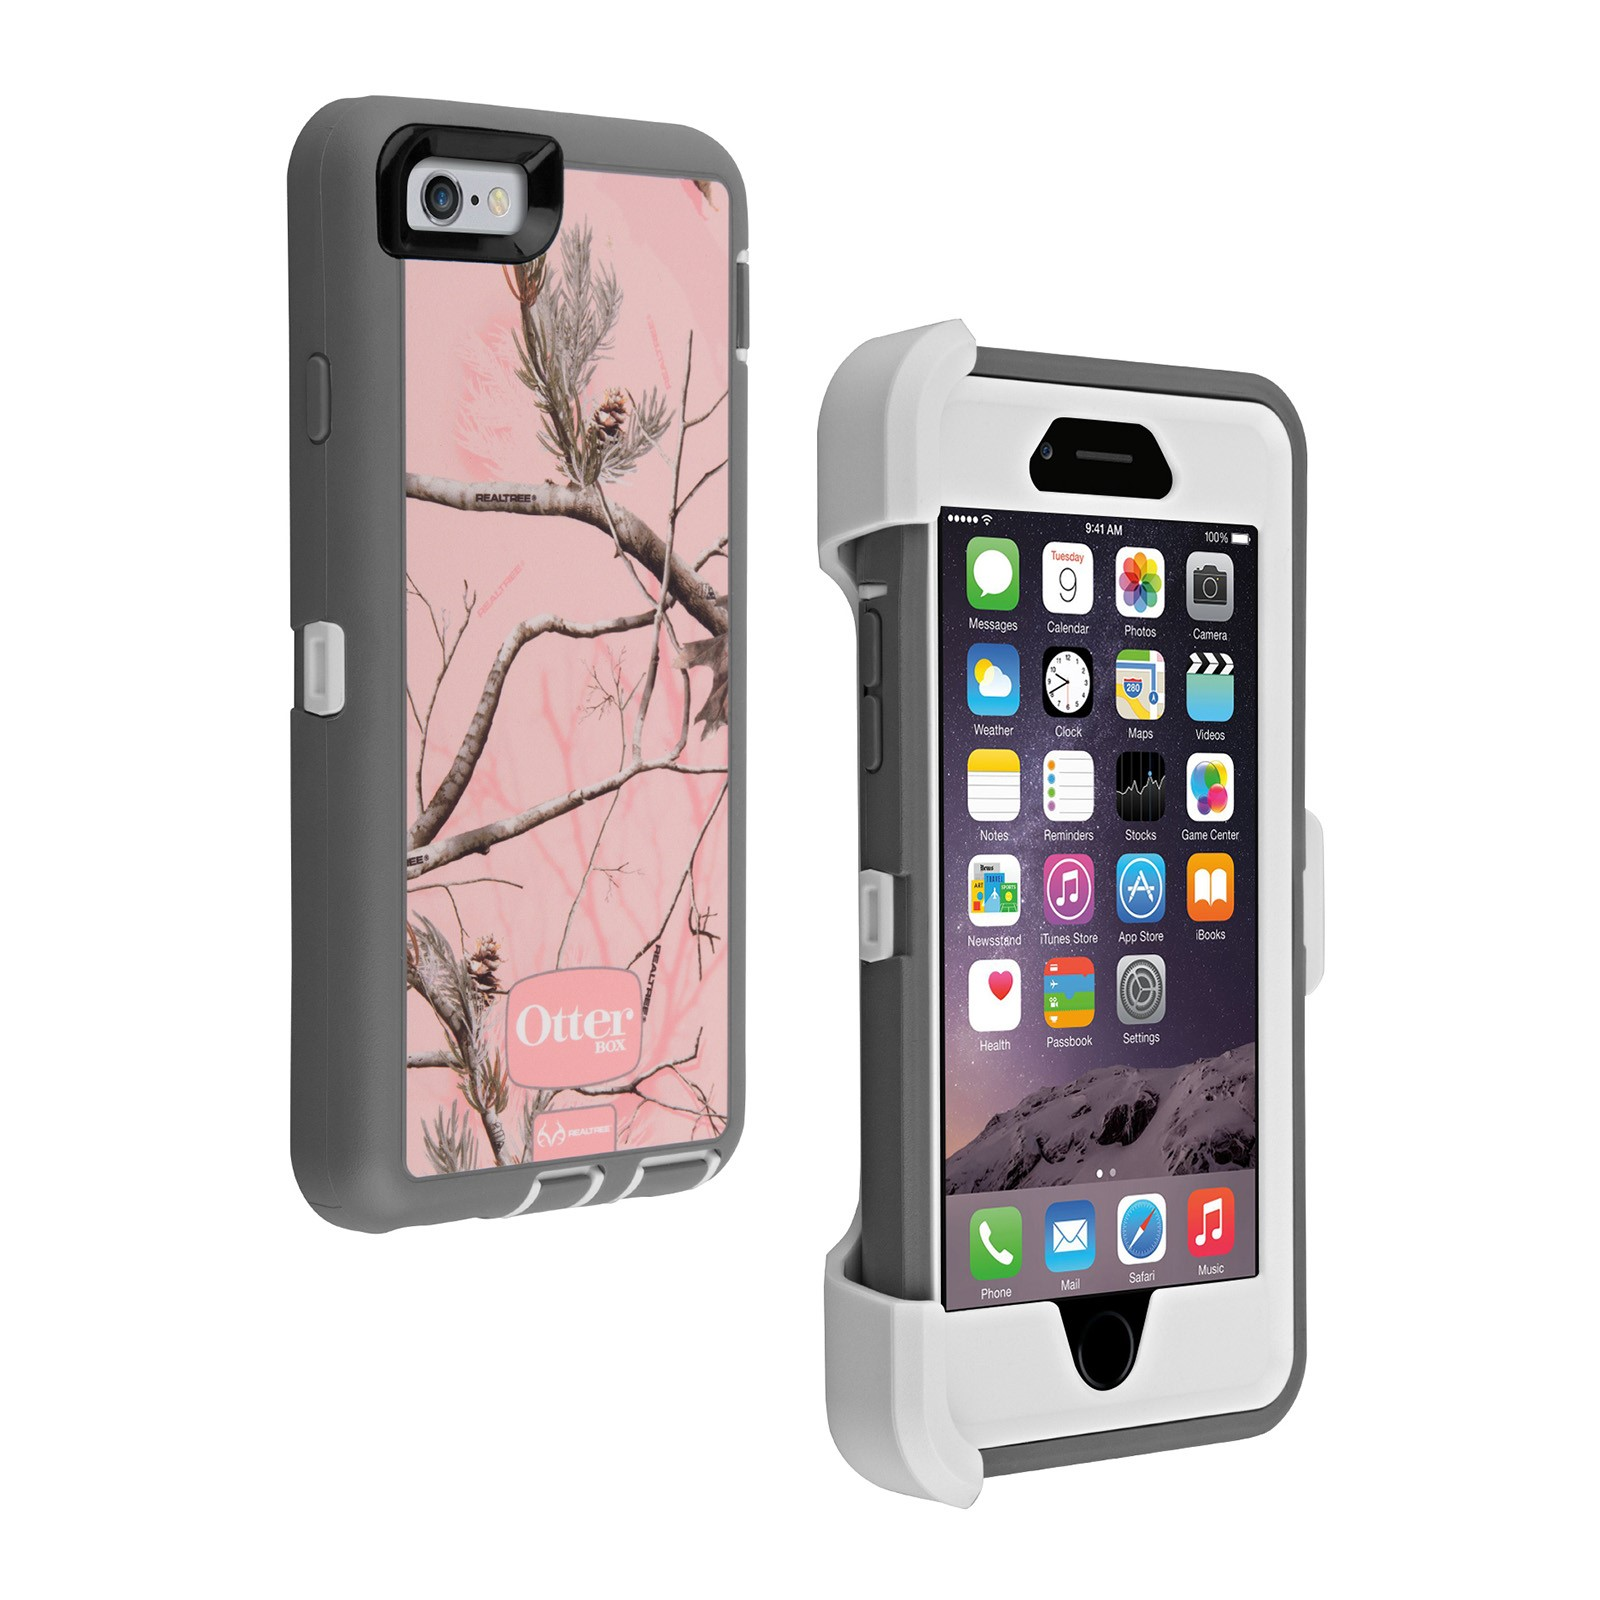 otterbox defender series case for apple iphone 6s 6 ebay. Black Bedroom Furniture Sets. Home Design Ideas